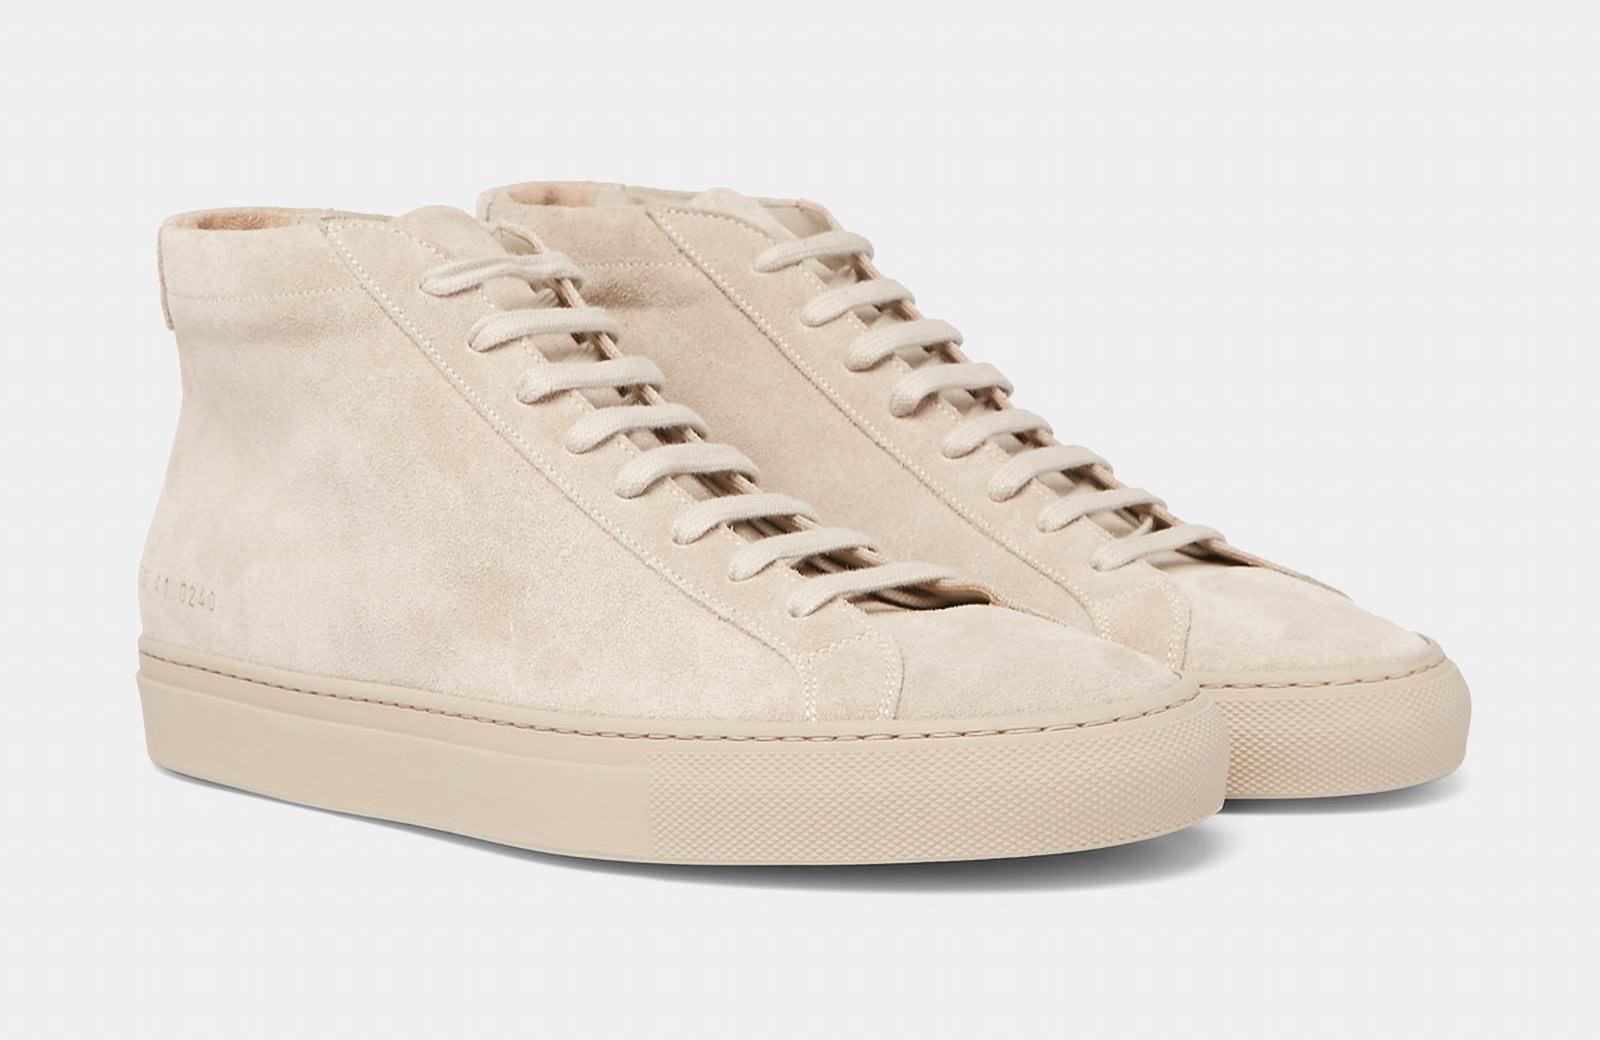 best high top sneaker men Common Project luxury style - Luxe Digital